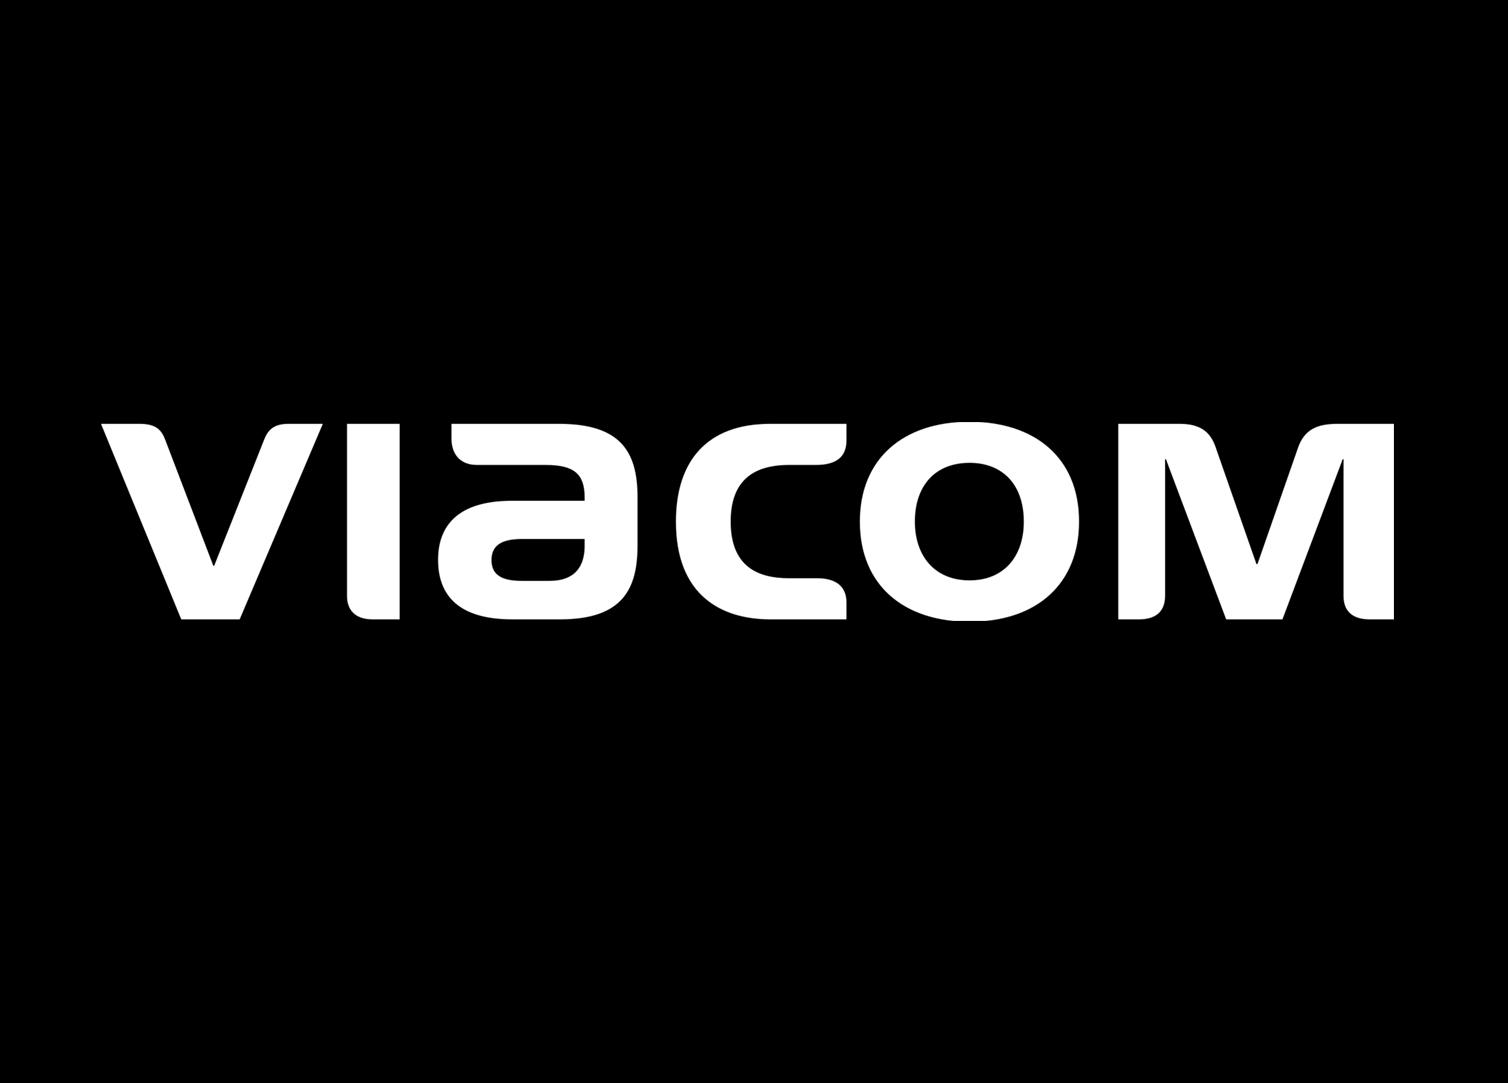 Viacom_TheSyndicate_Marketing.jpg